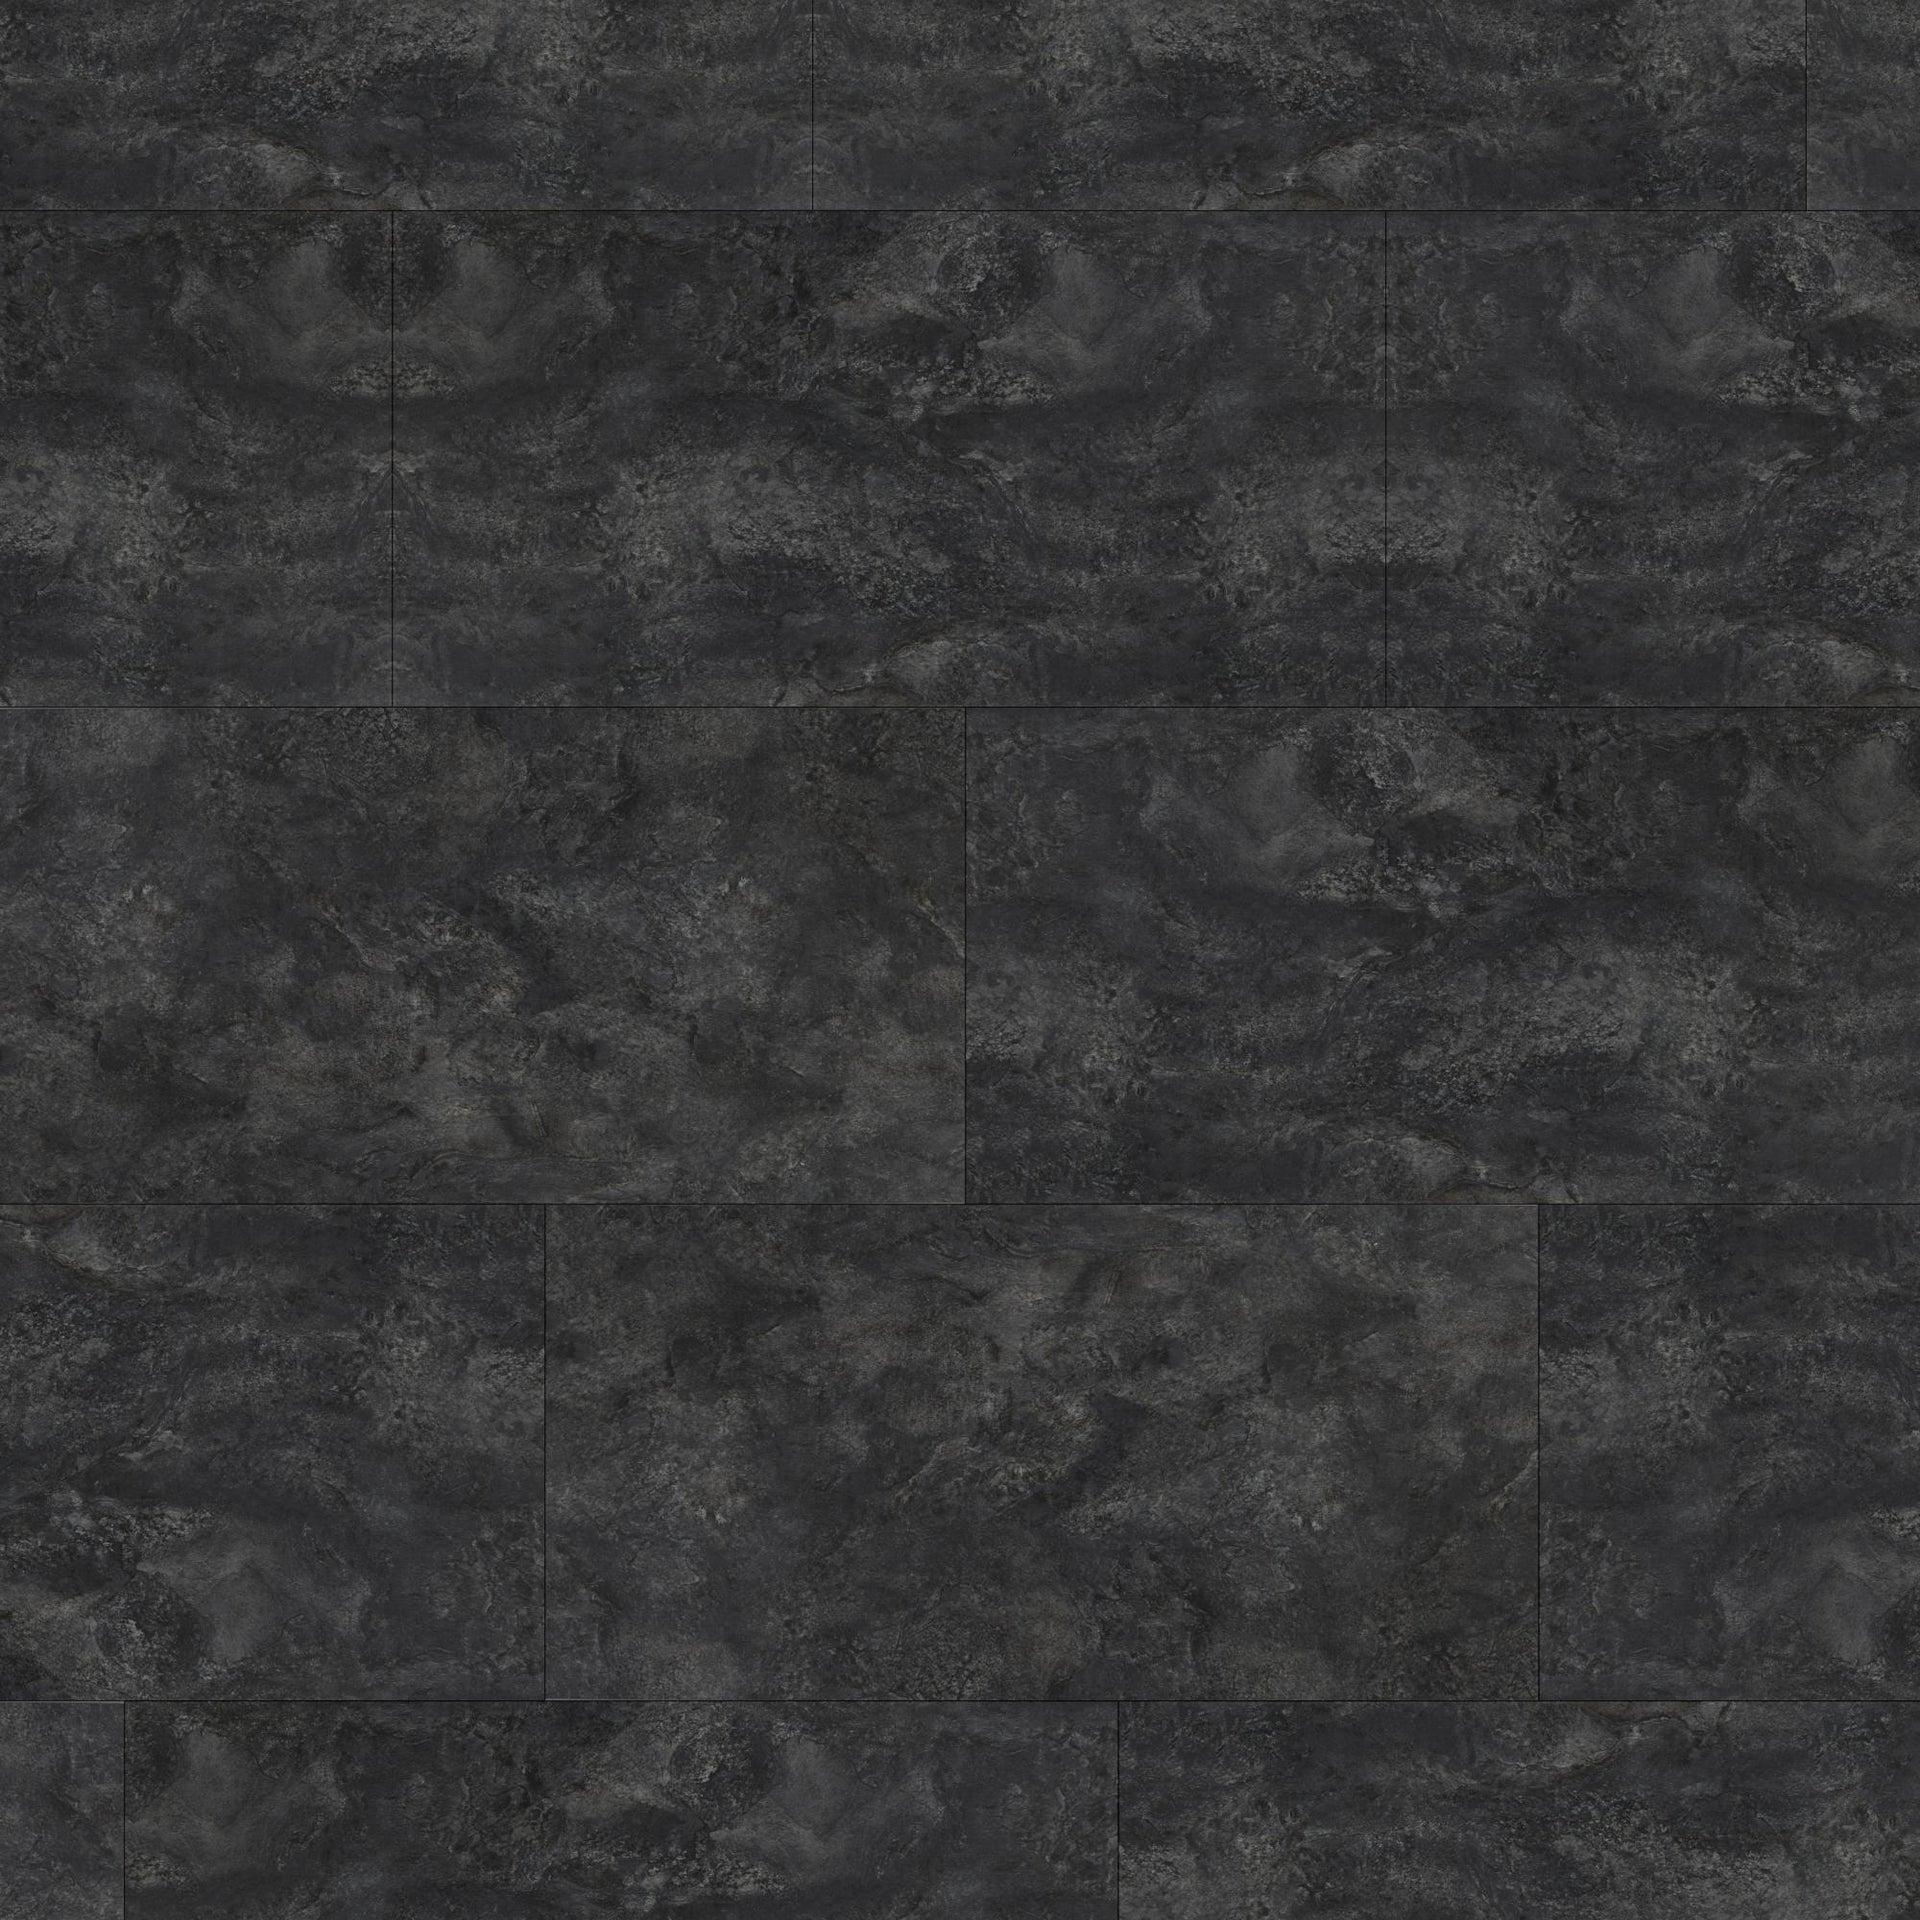 Pavimento PVC flottante clic+ Slate Sp 5 mm nero - 4